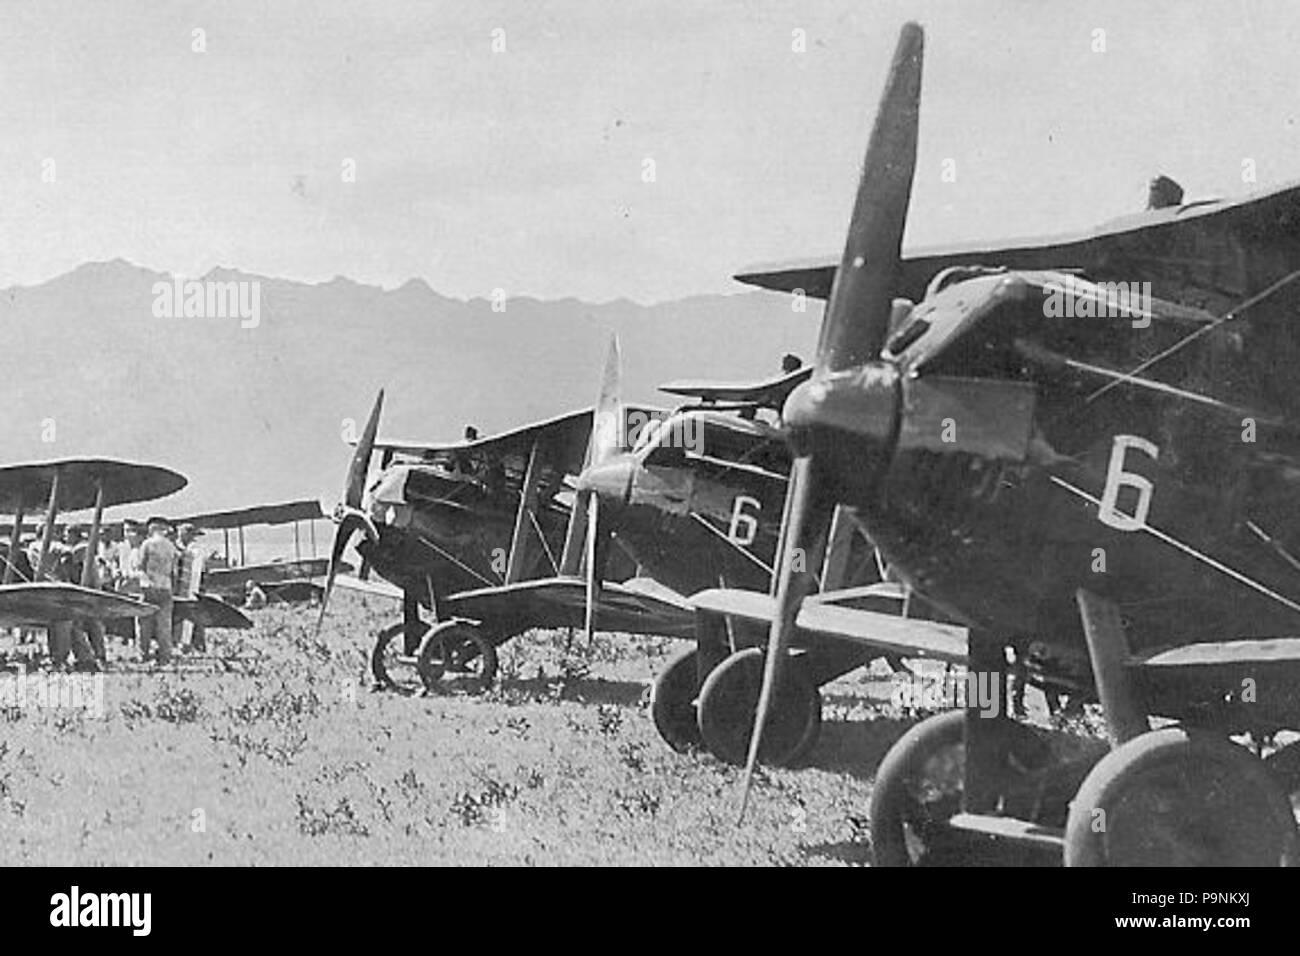 72 6th Aero Squadron JN-6s - Stock Image